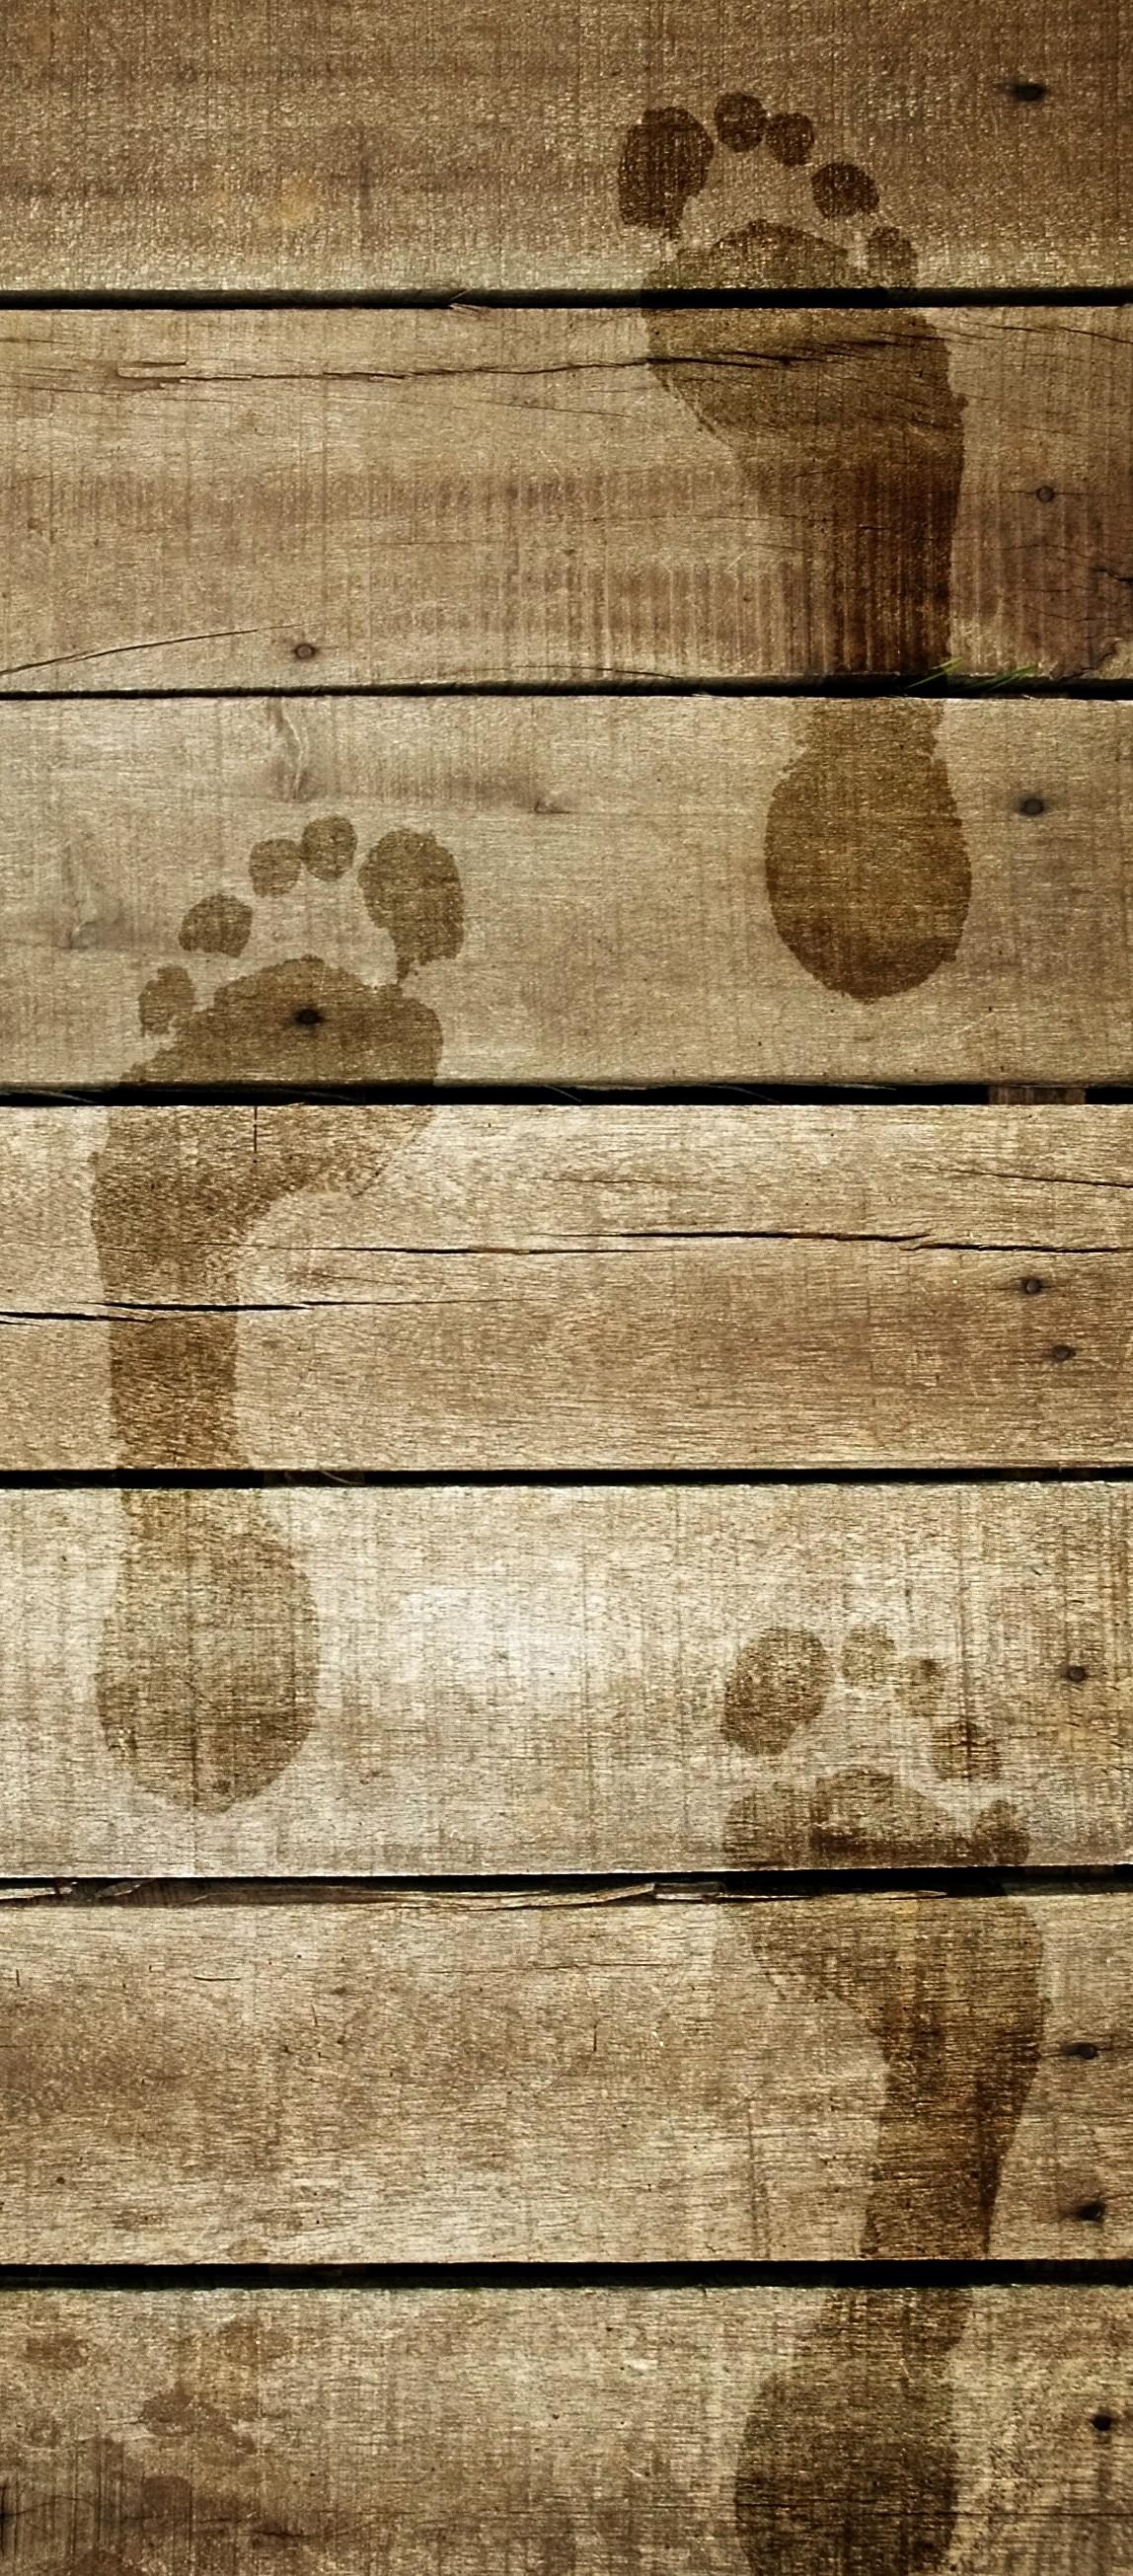 Nancy Maijs Footprint